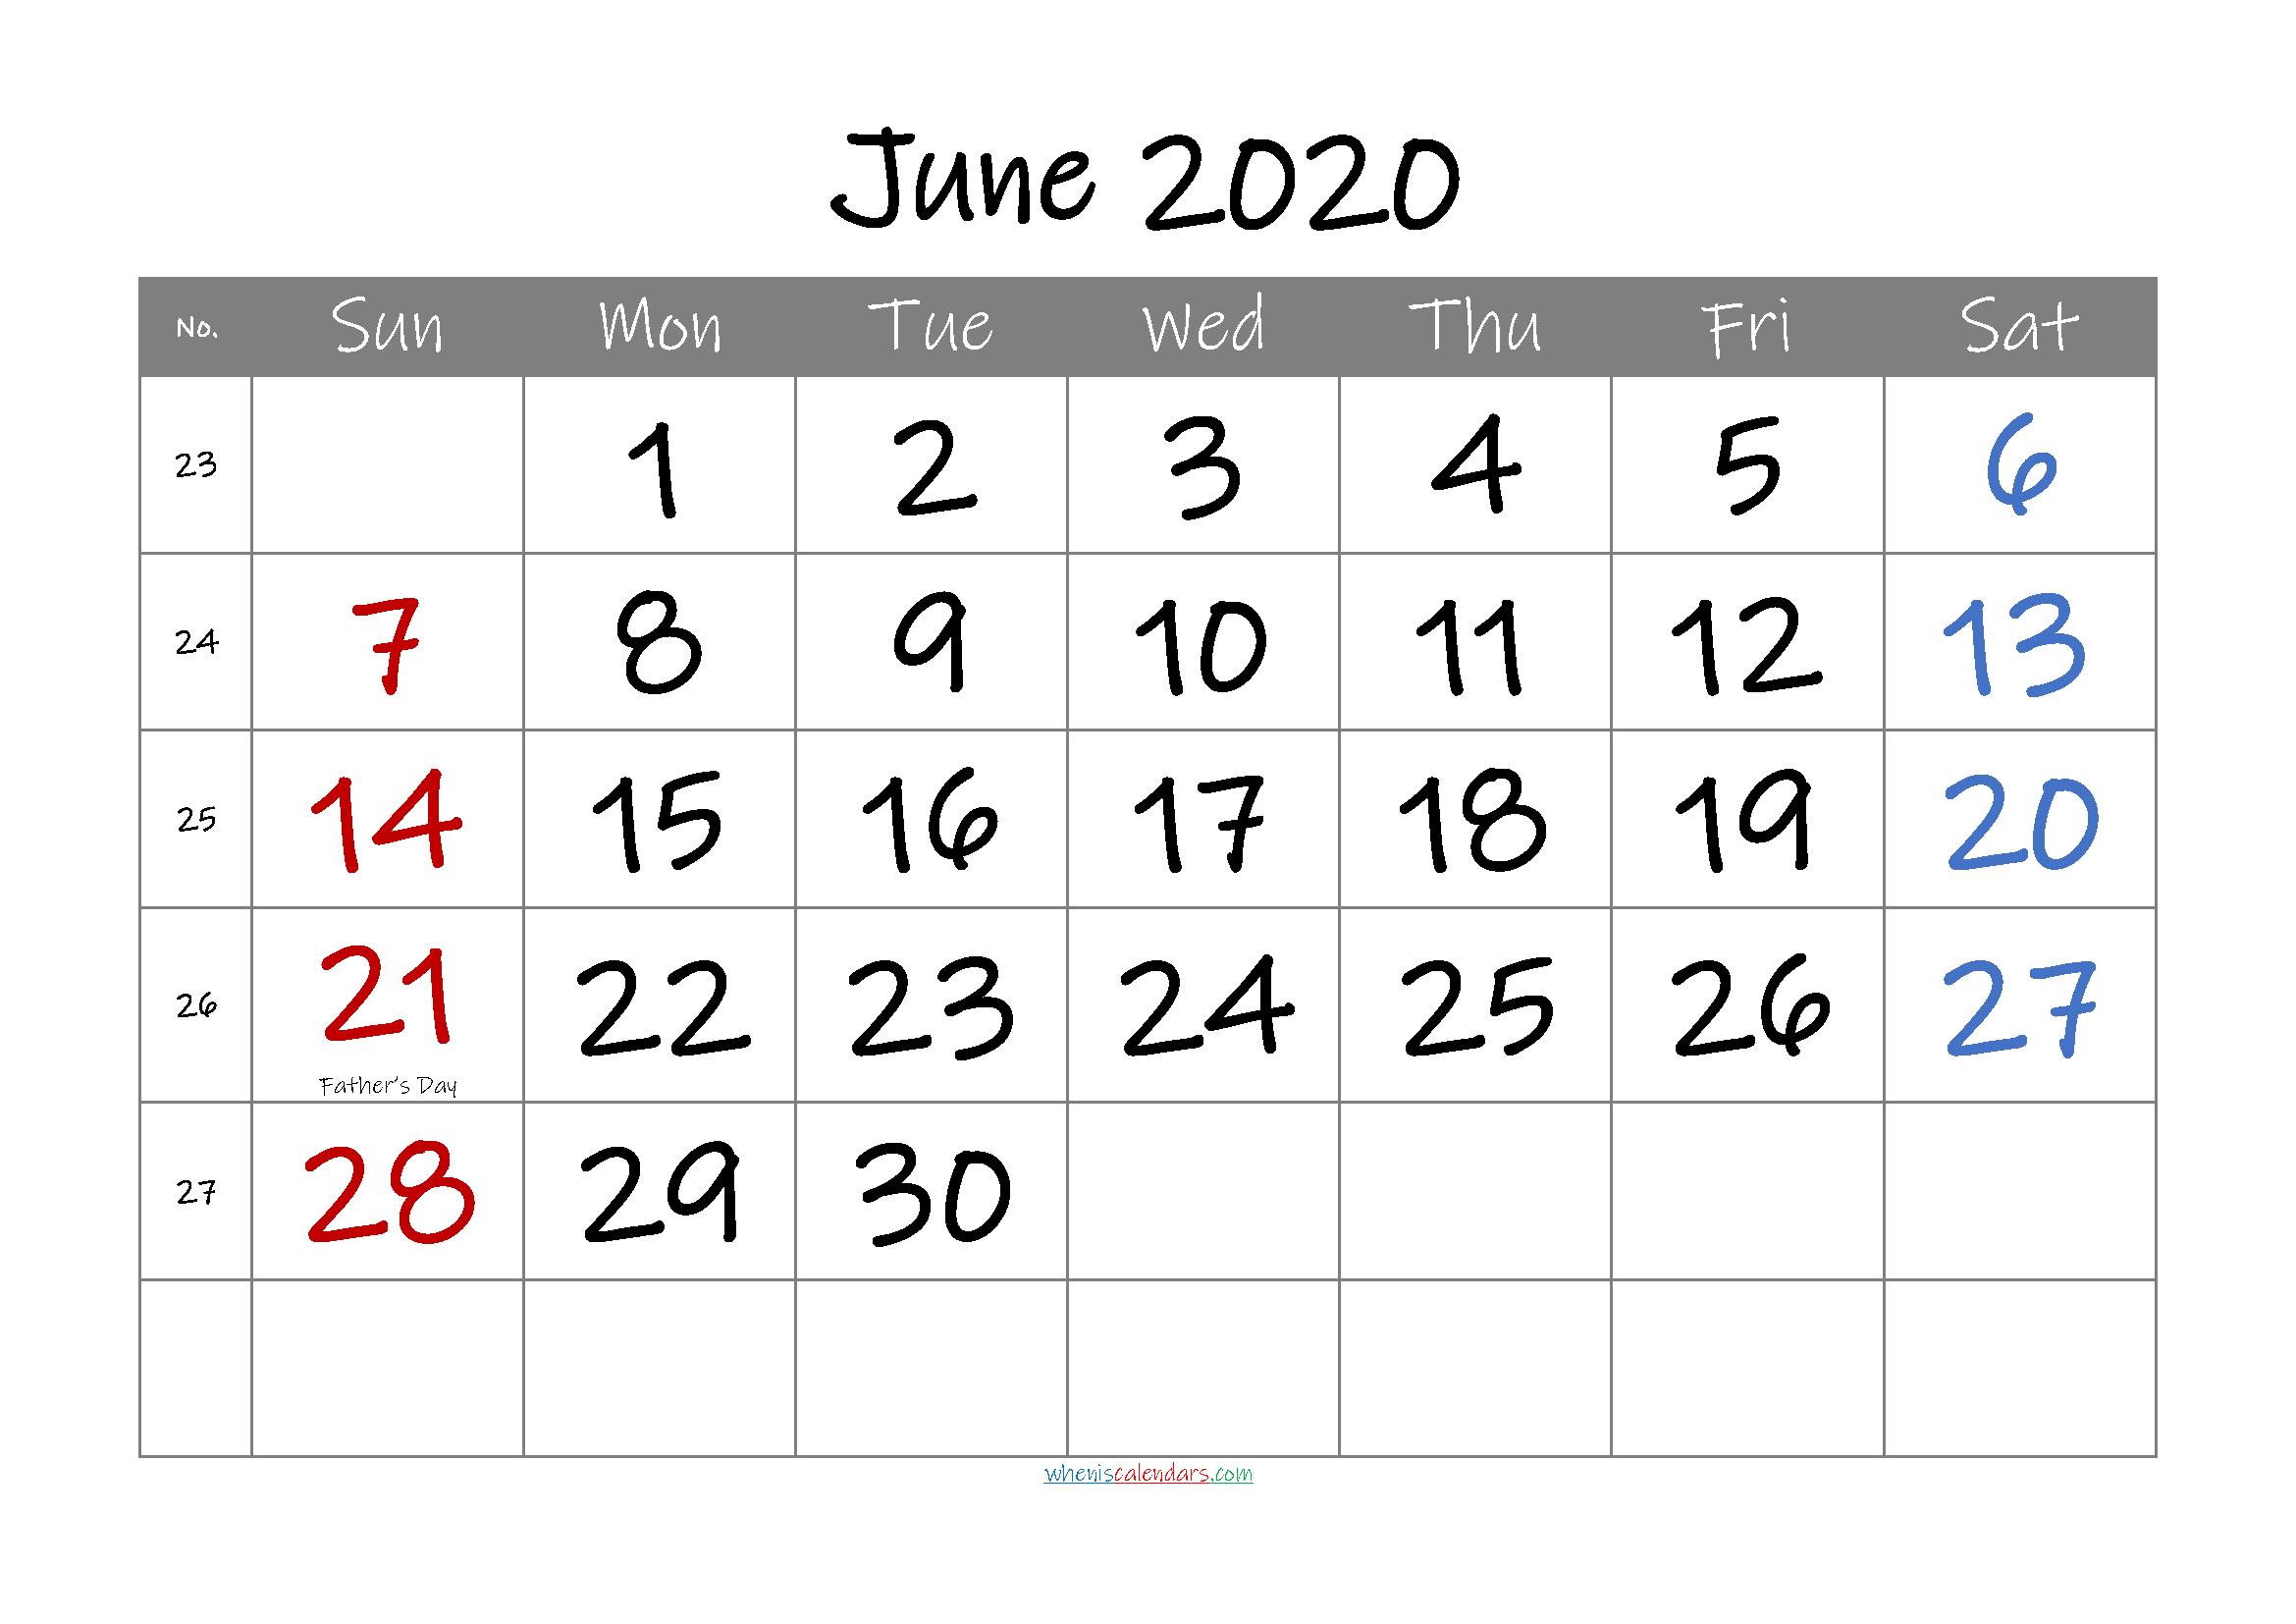 Free Printable June 2020 Calendar with Holidays